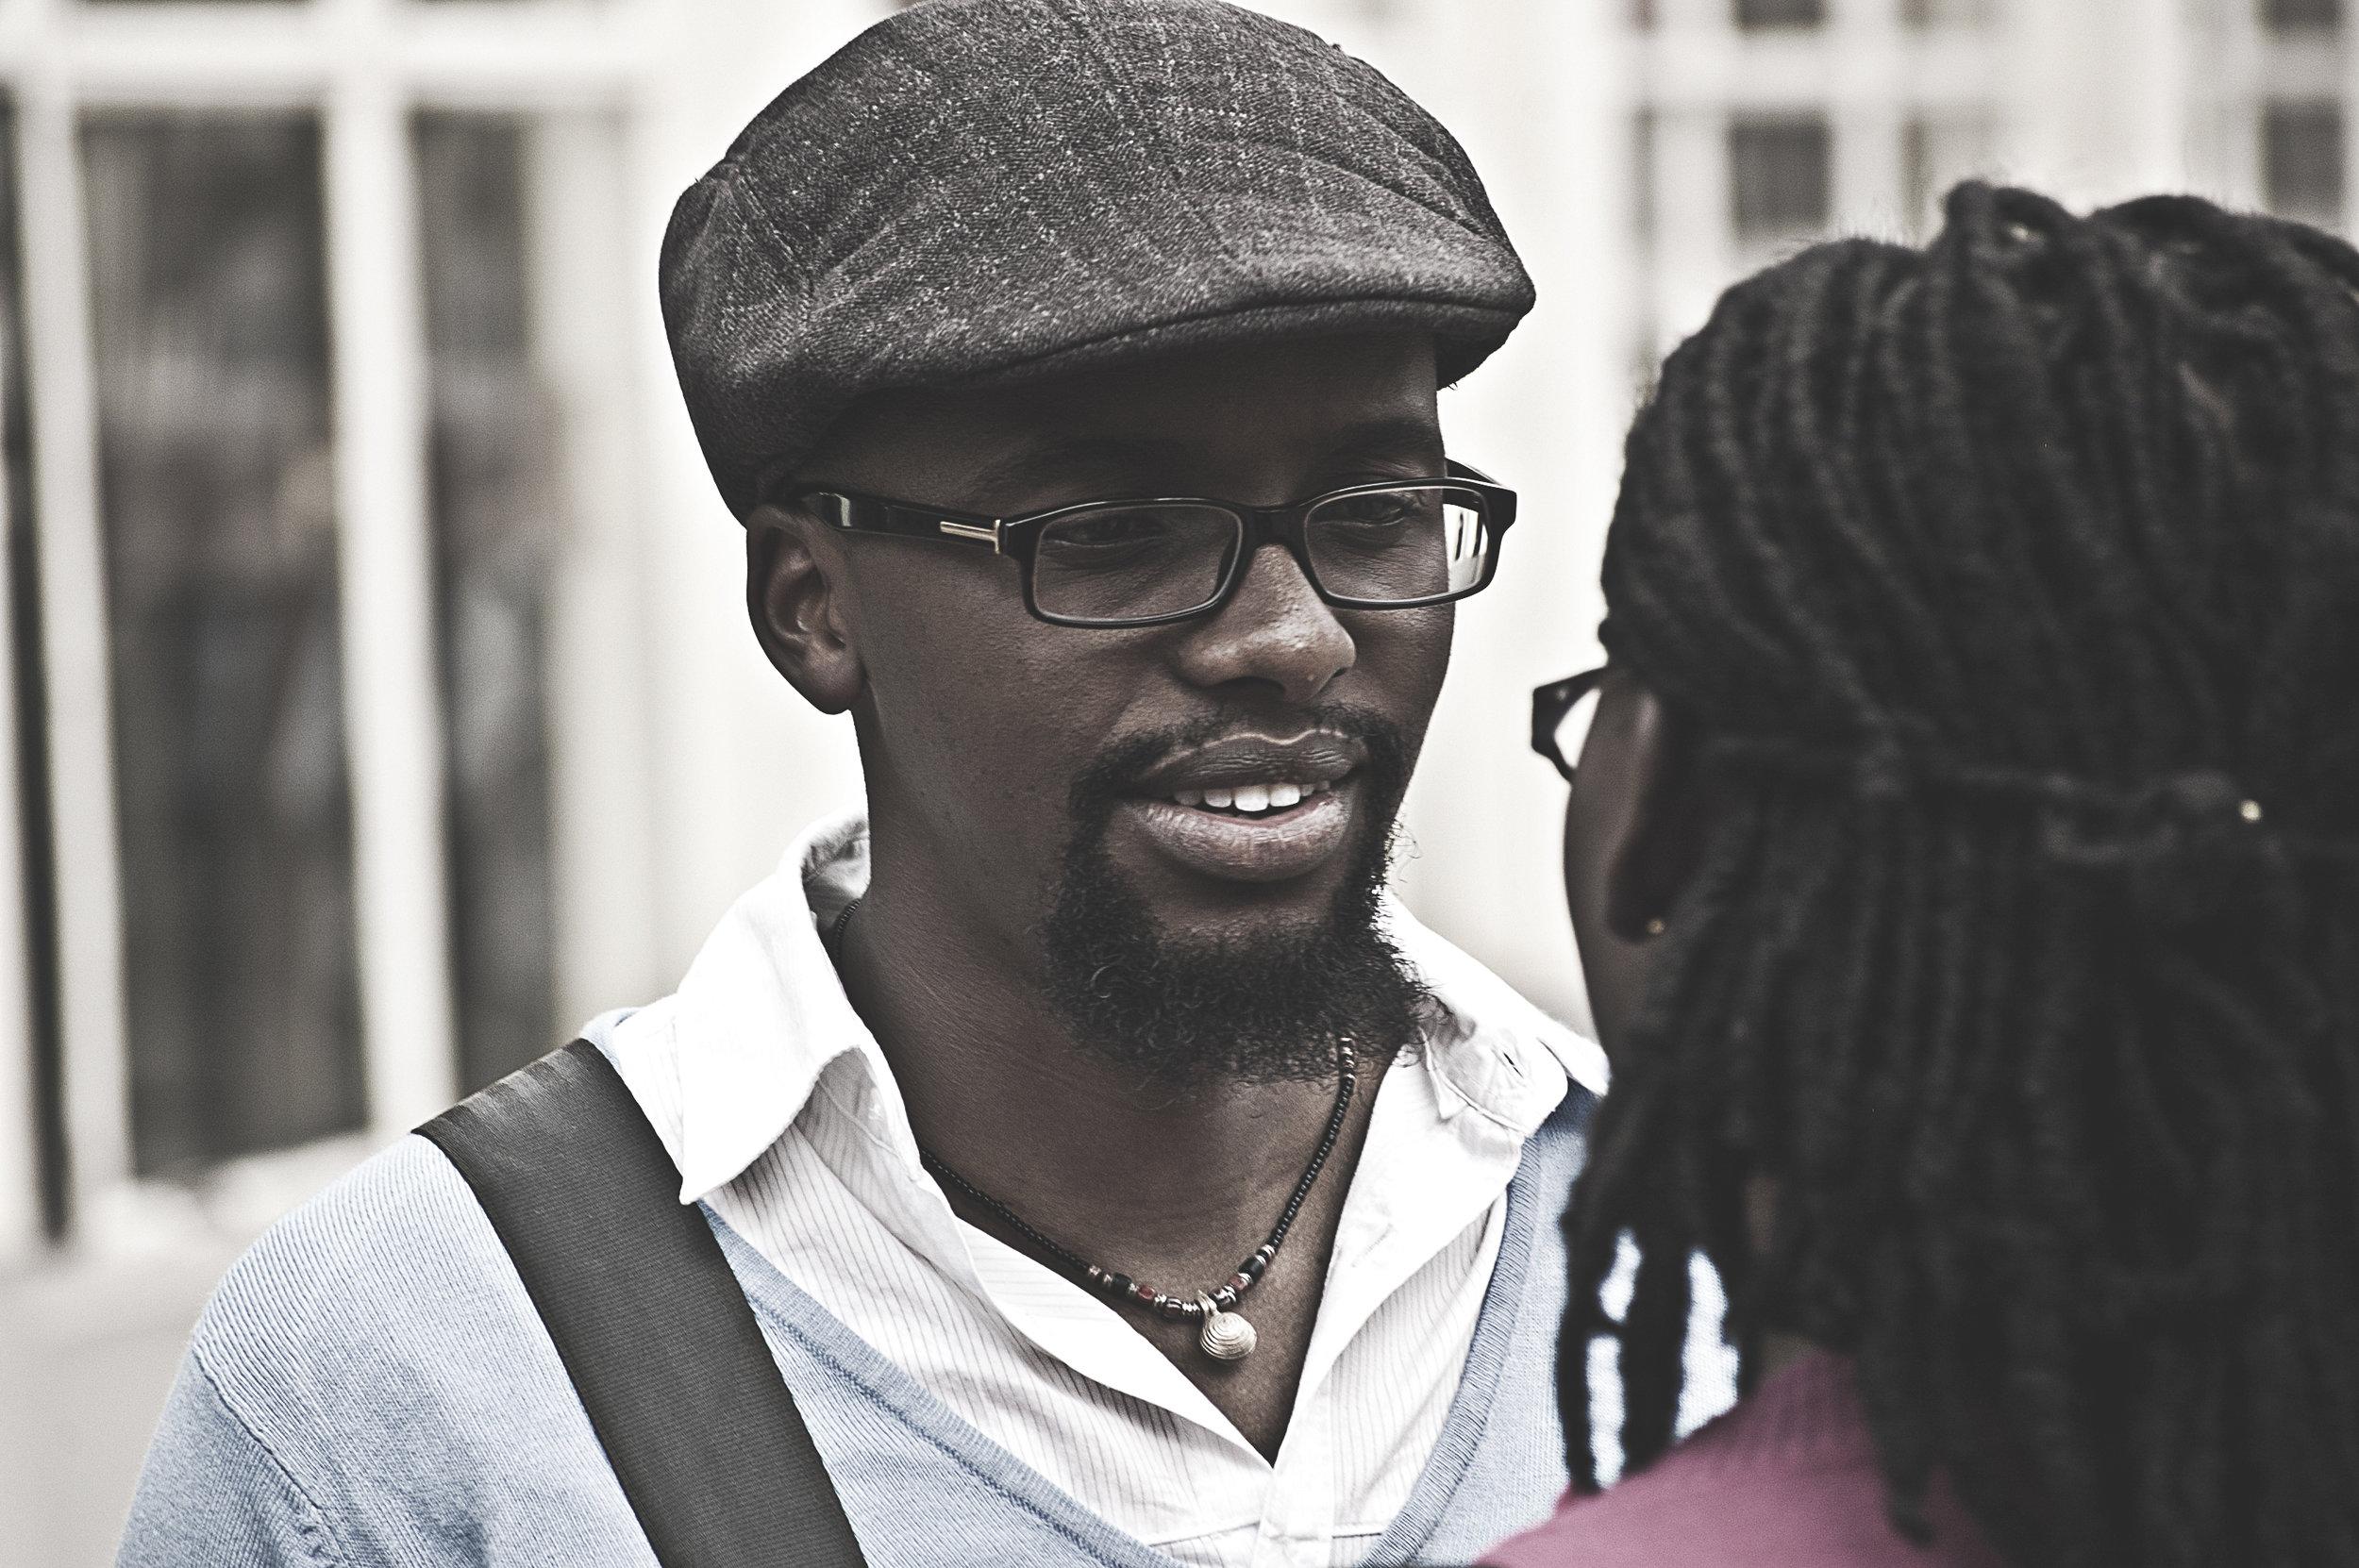 Set still from 'Sauti' (2012). Joshua Obaga